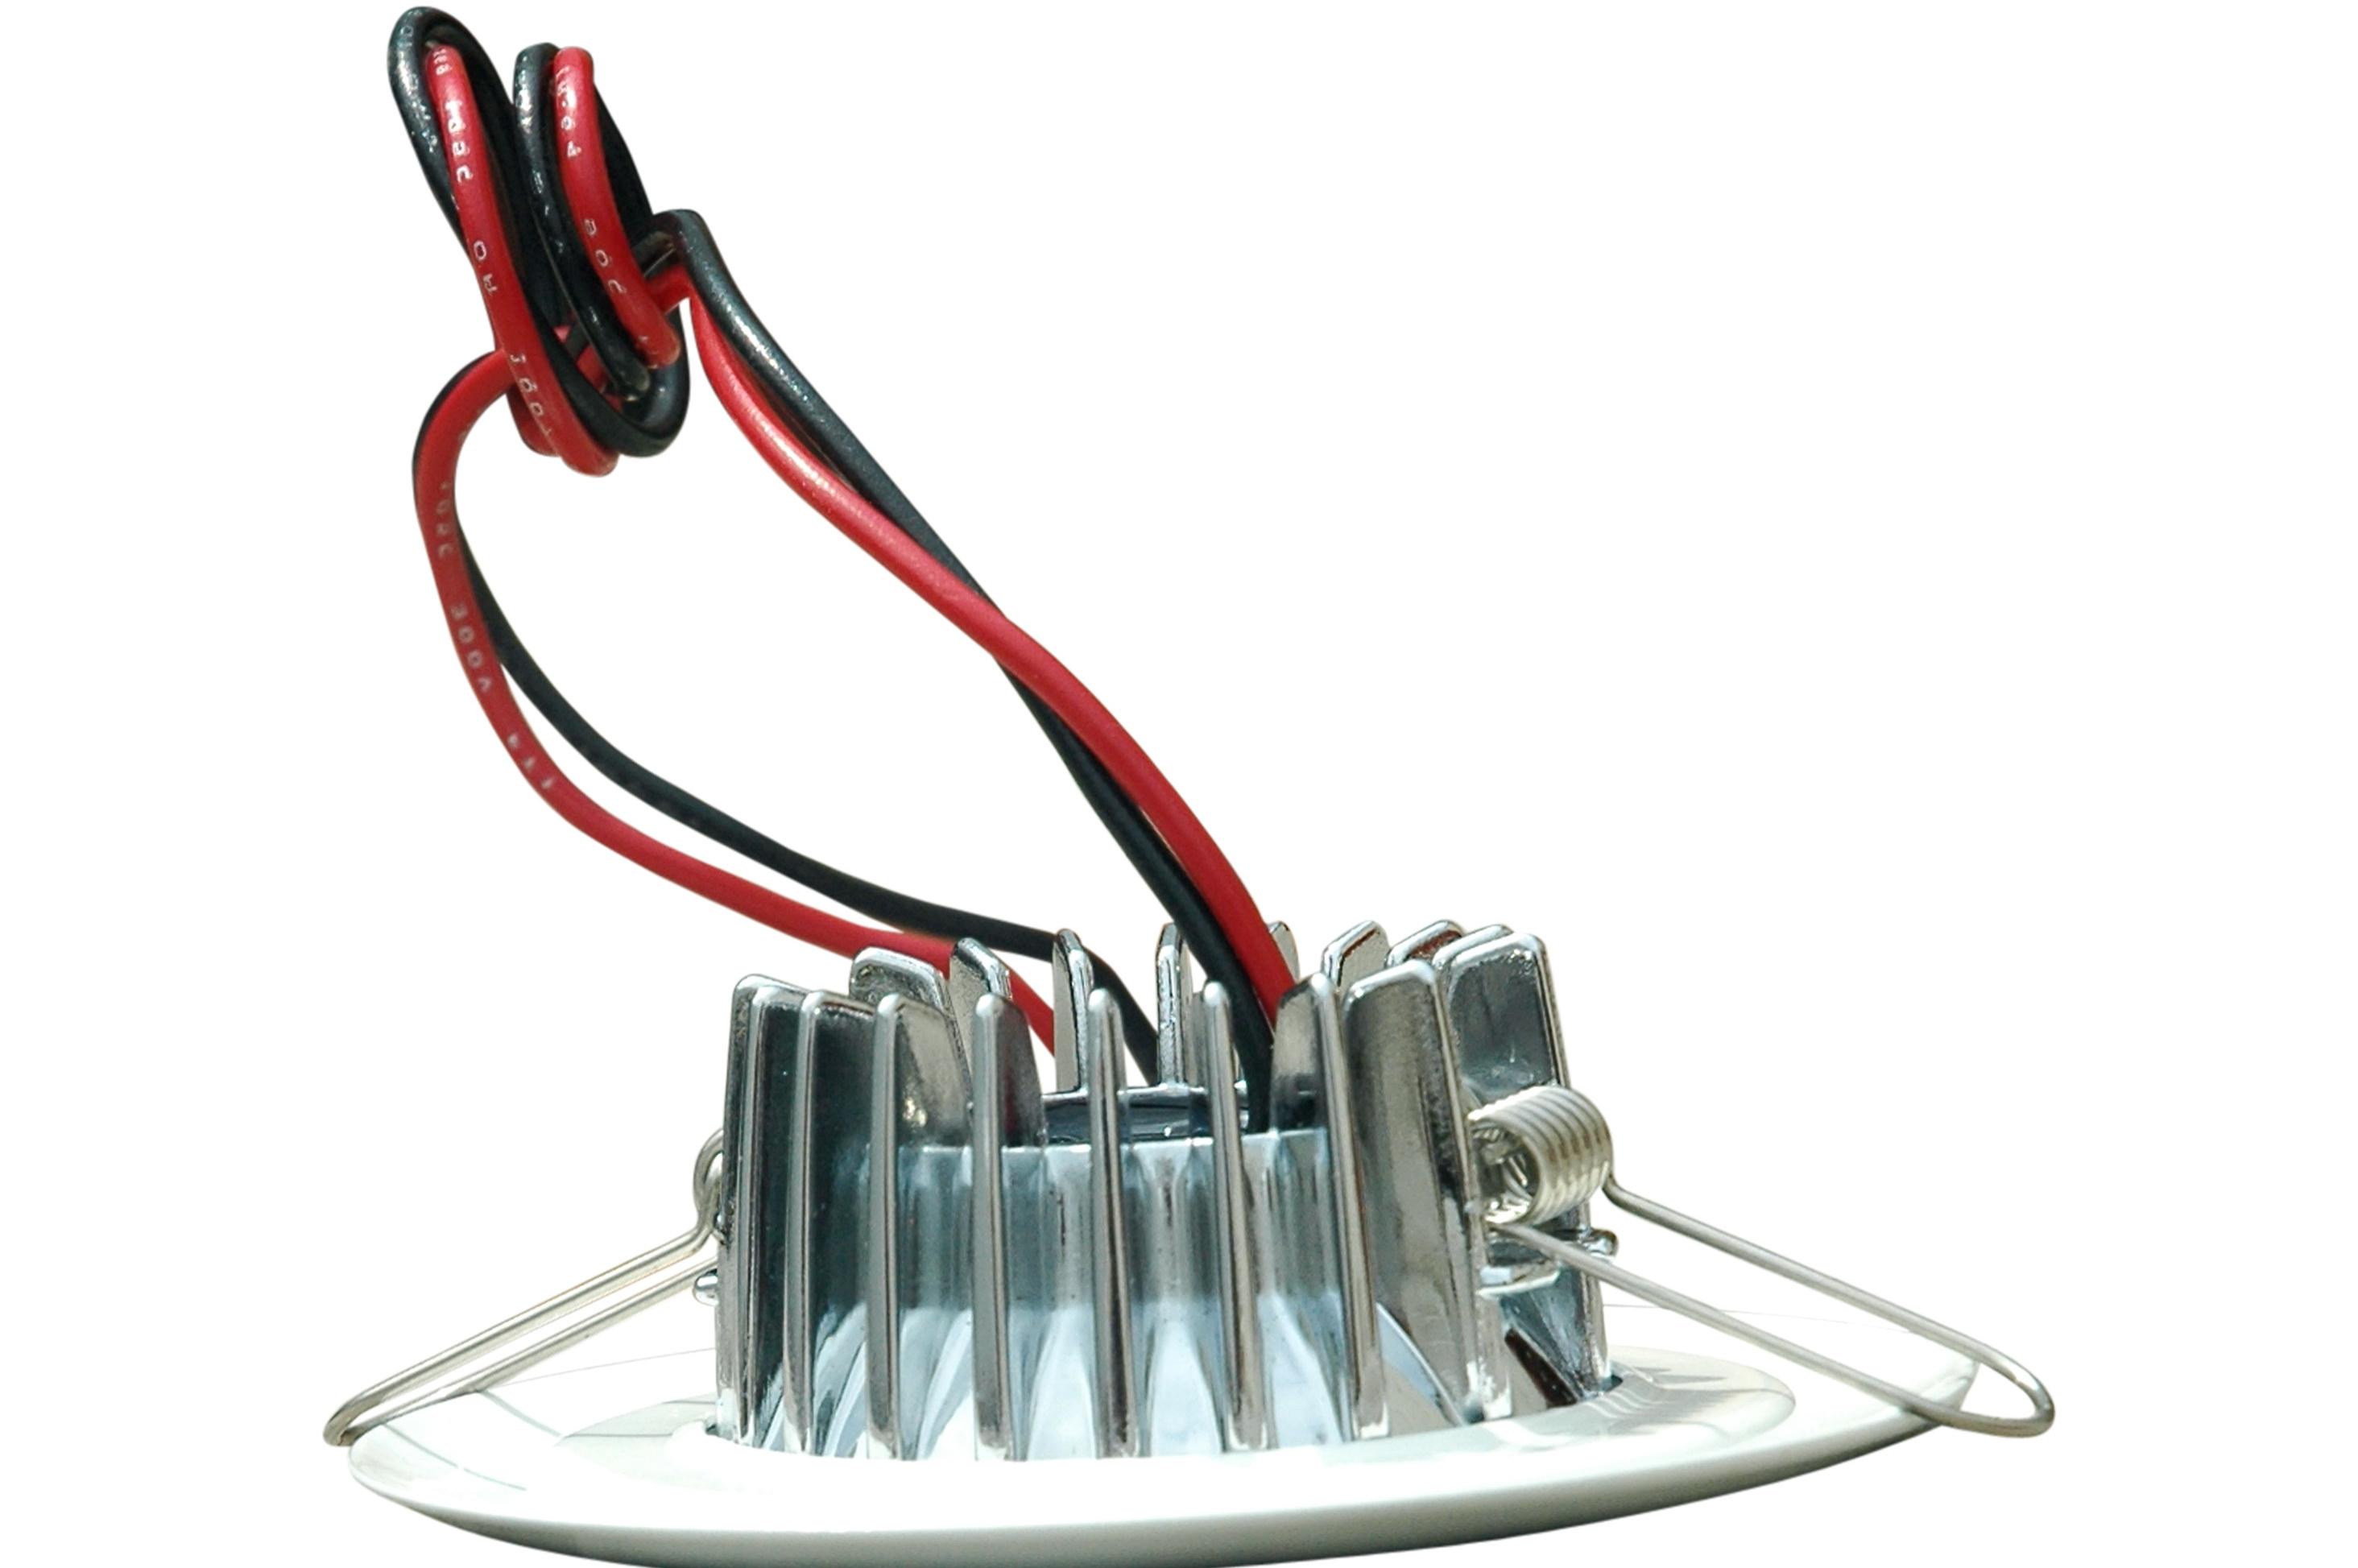 low voltage lighting wiring diagram sagittal brain labeled deck home design ideas